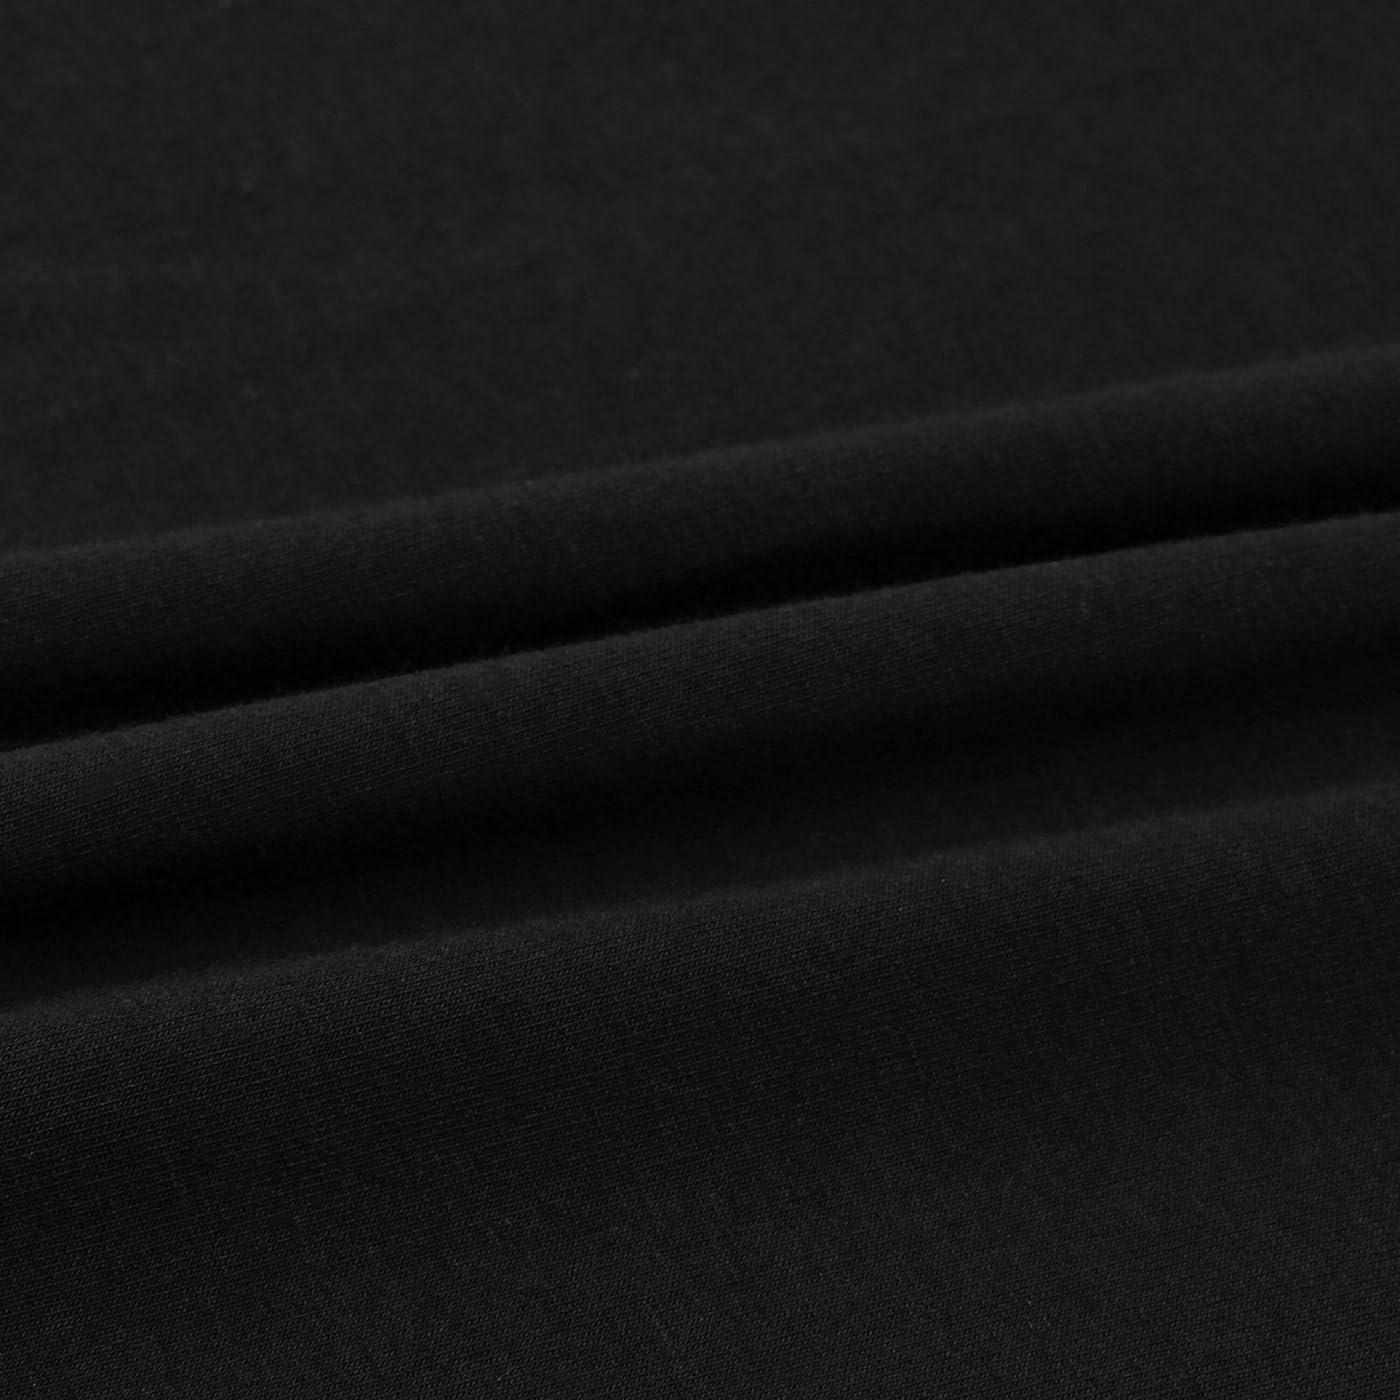 Liang Rou Crewneck Modal /& Cotton Thermal Baselayer Top for Women